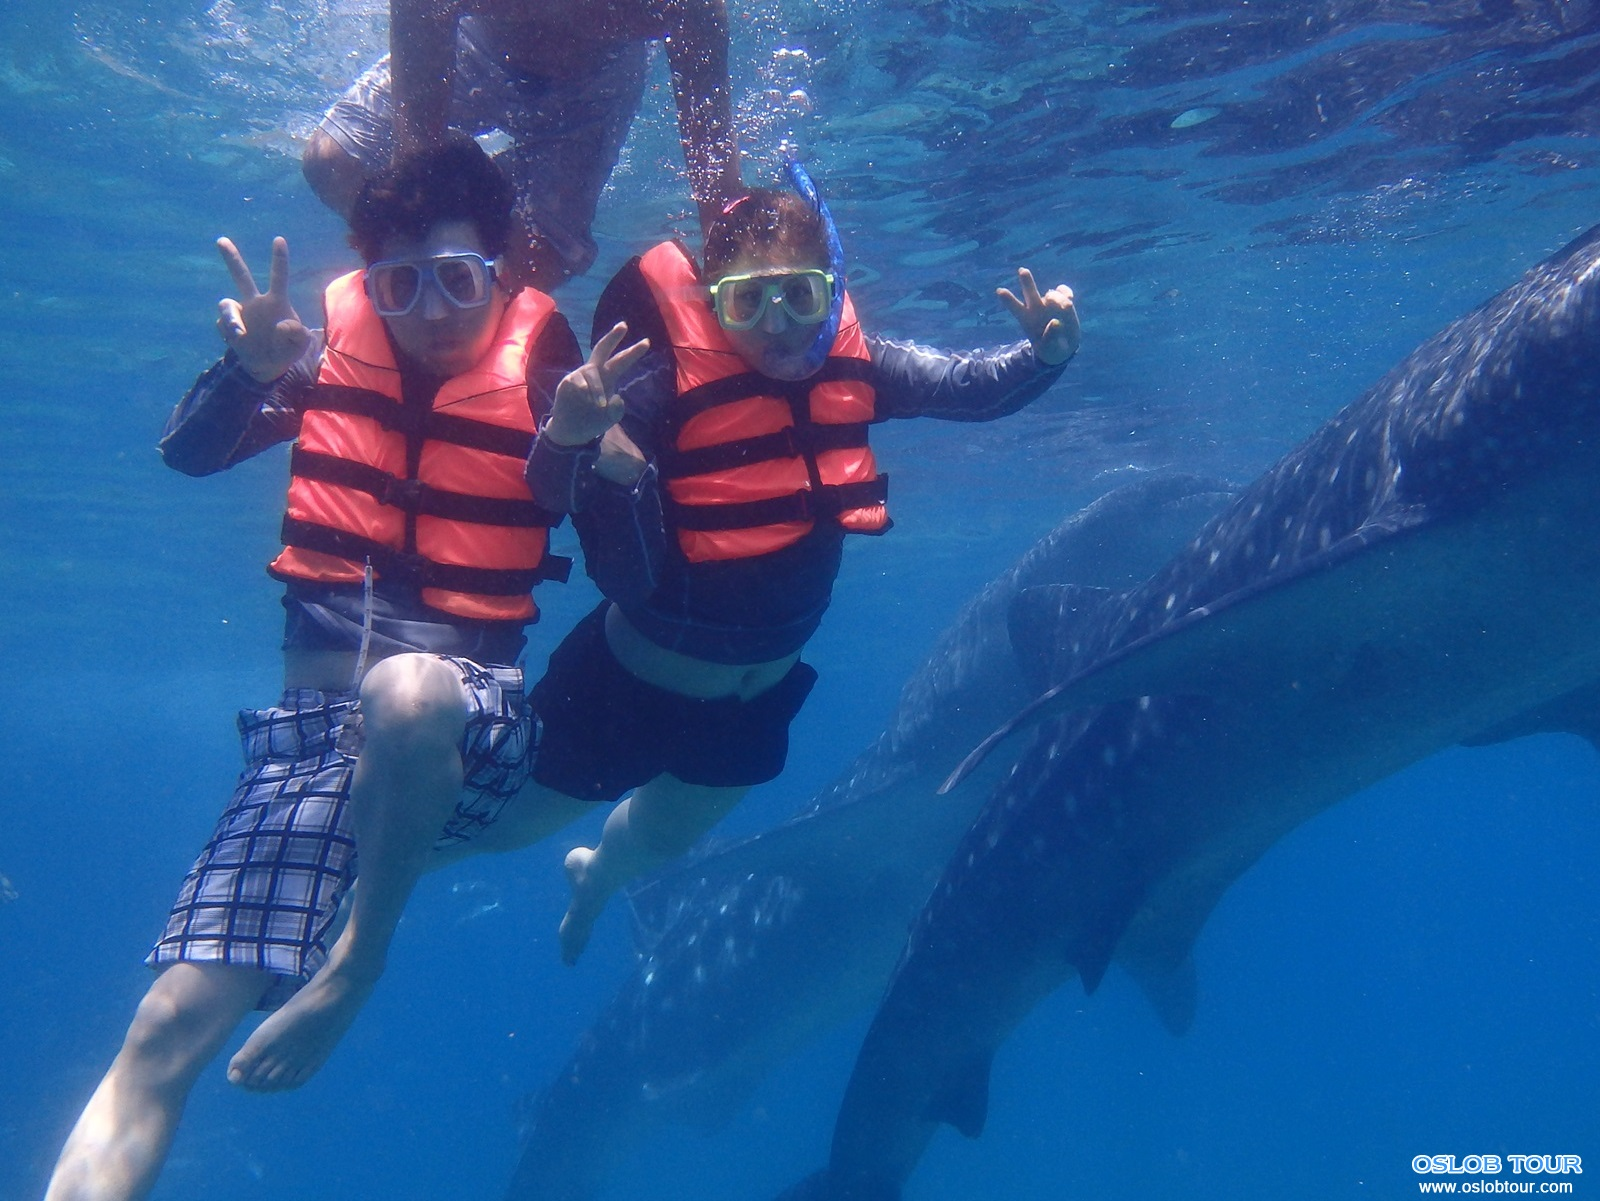 cebu oslob whale shark watching day tour 9 aug 2014 oslob tour